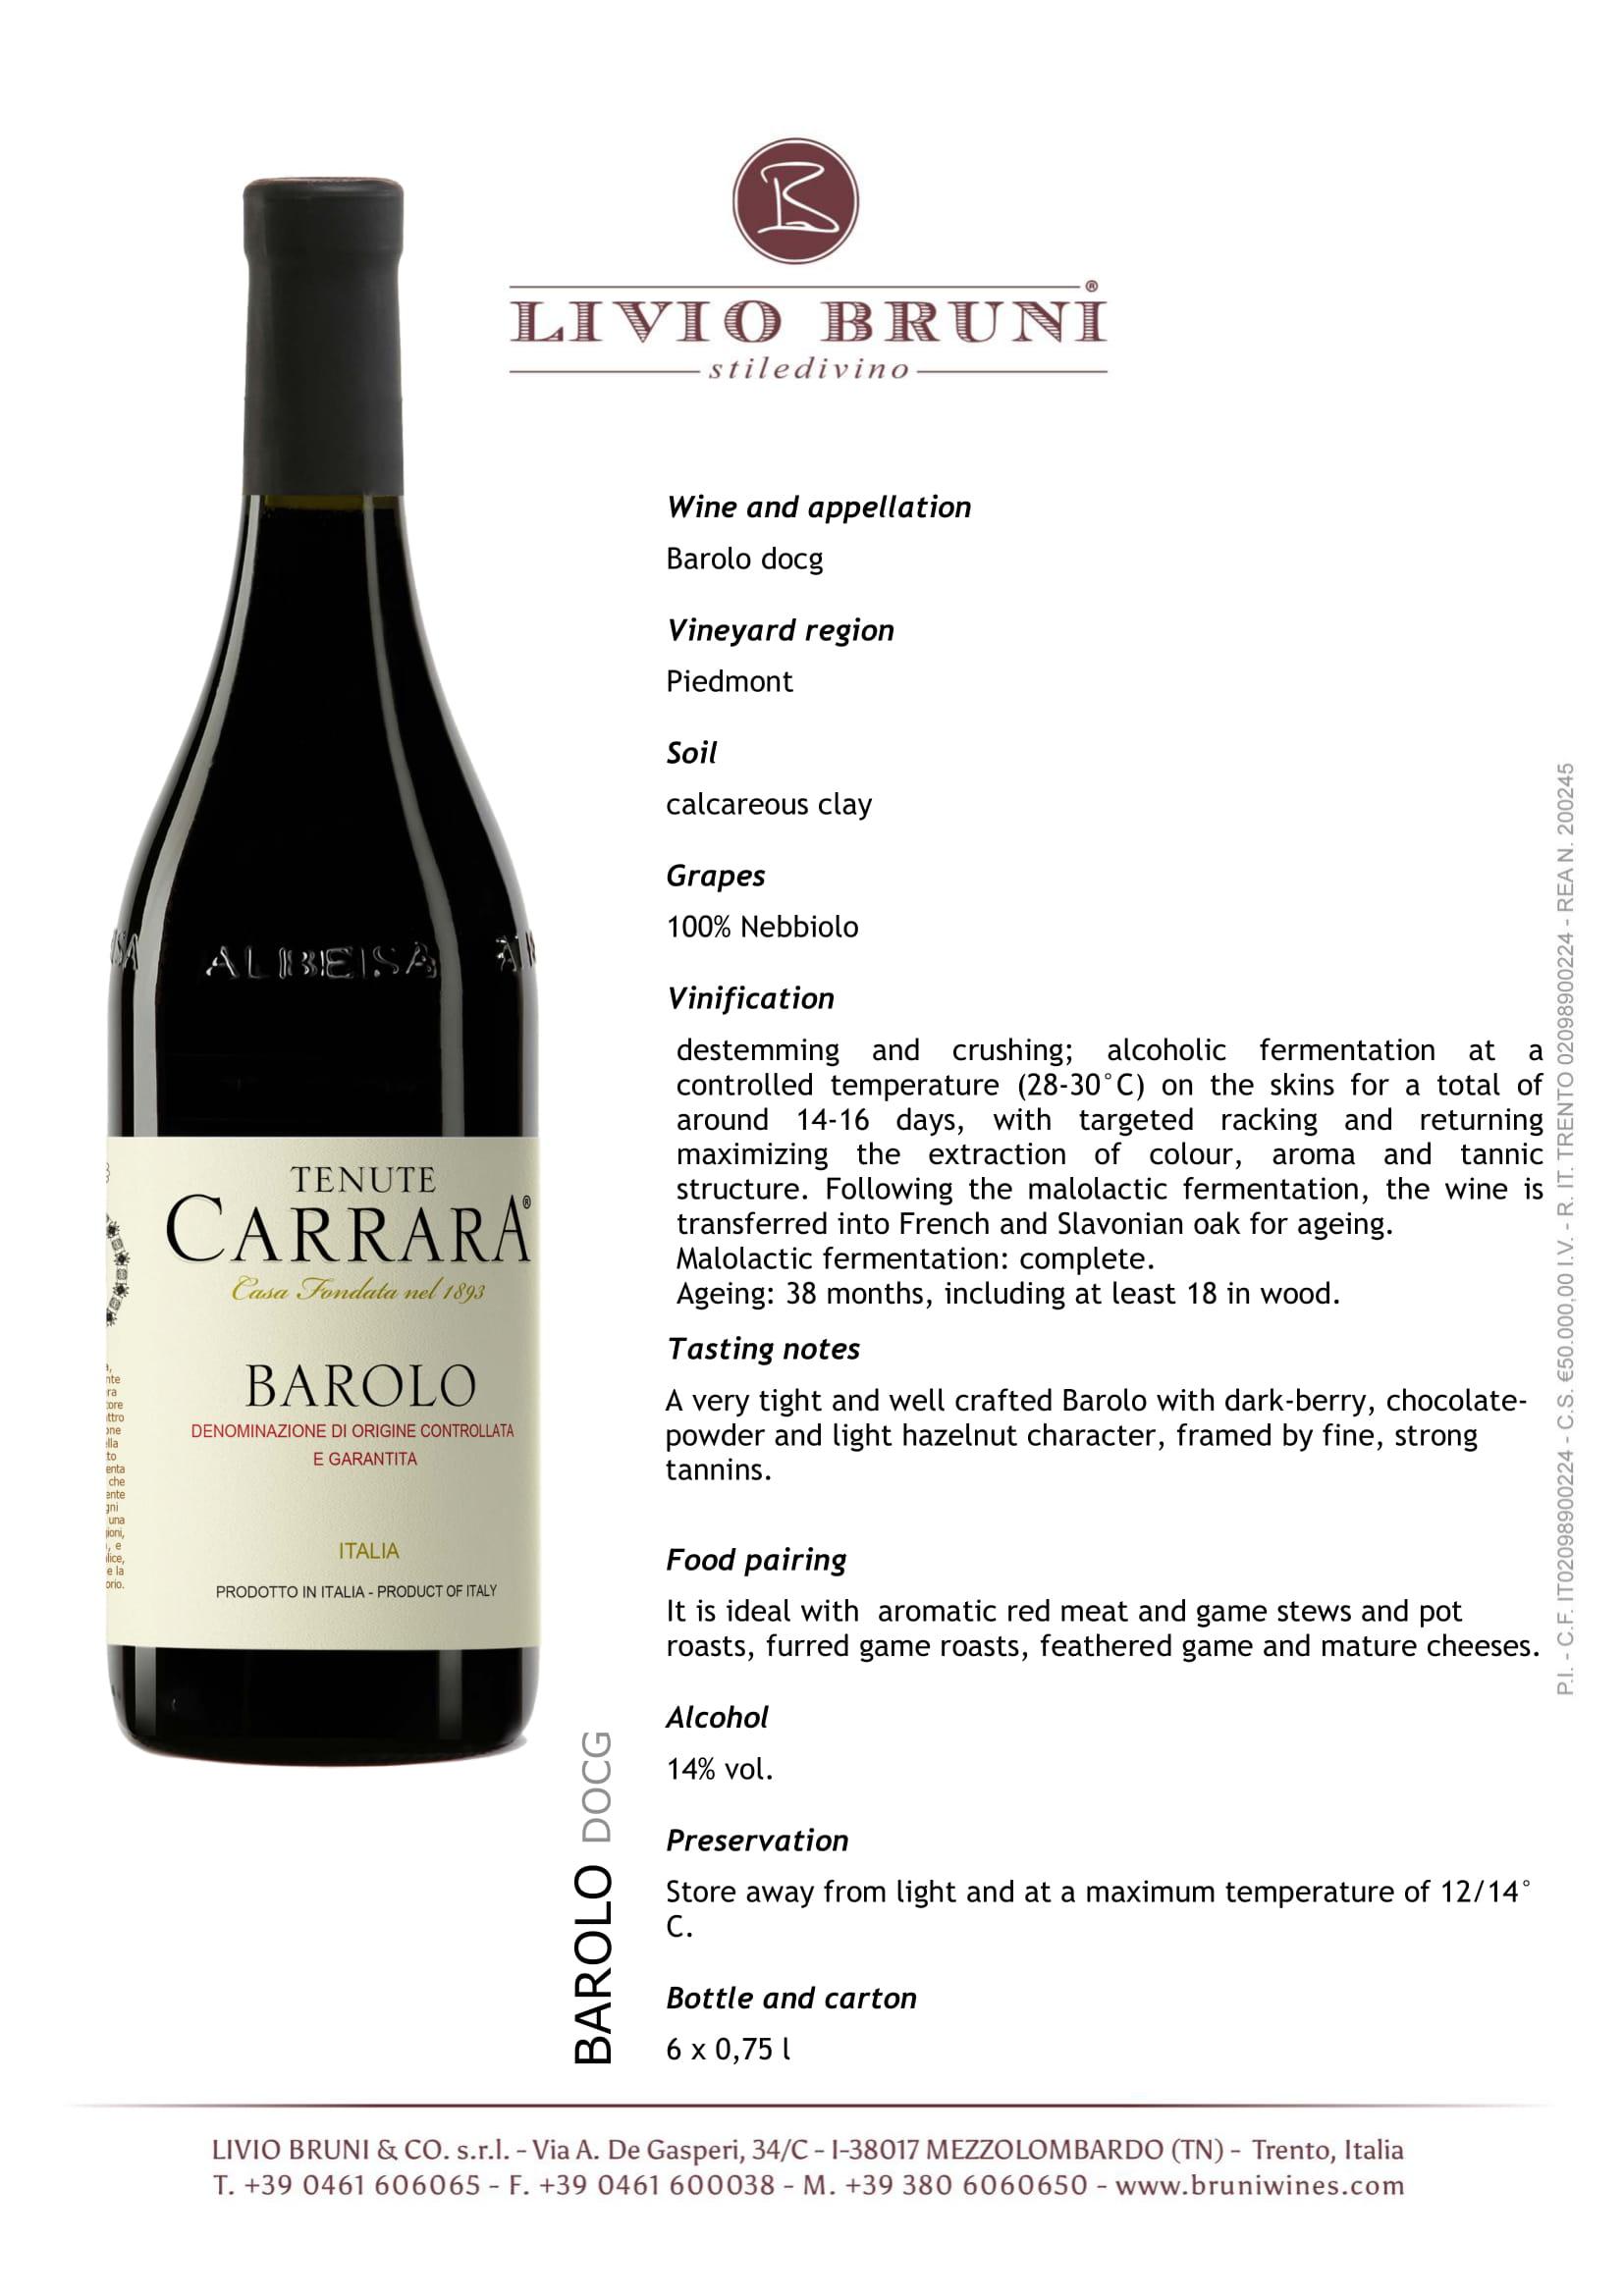 Tenute Carrara Barolo Tech Sheet